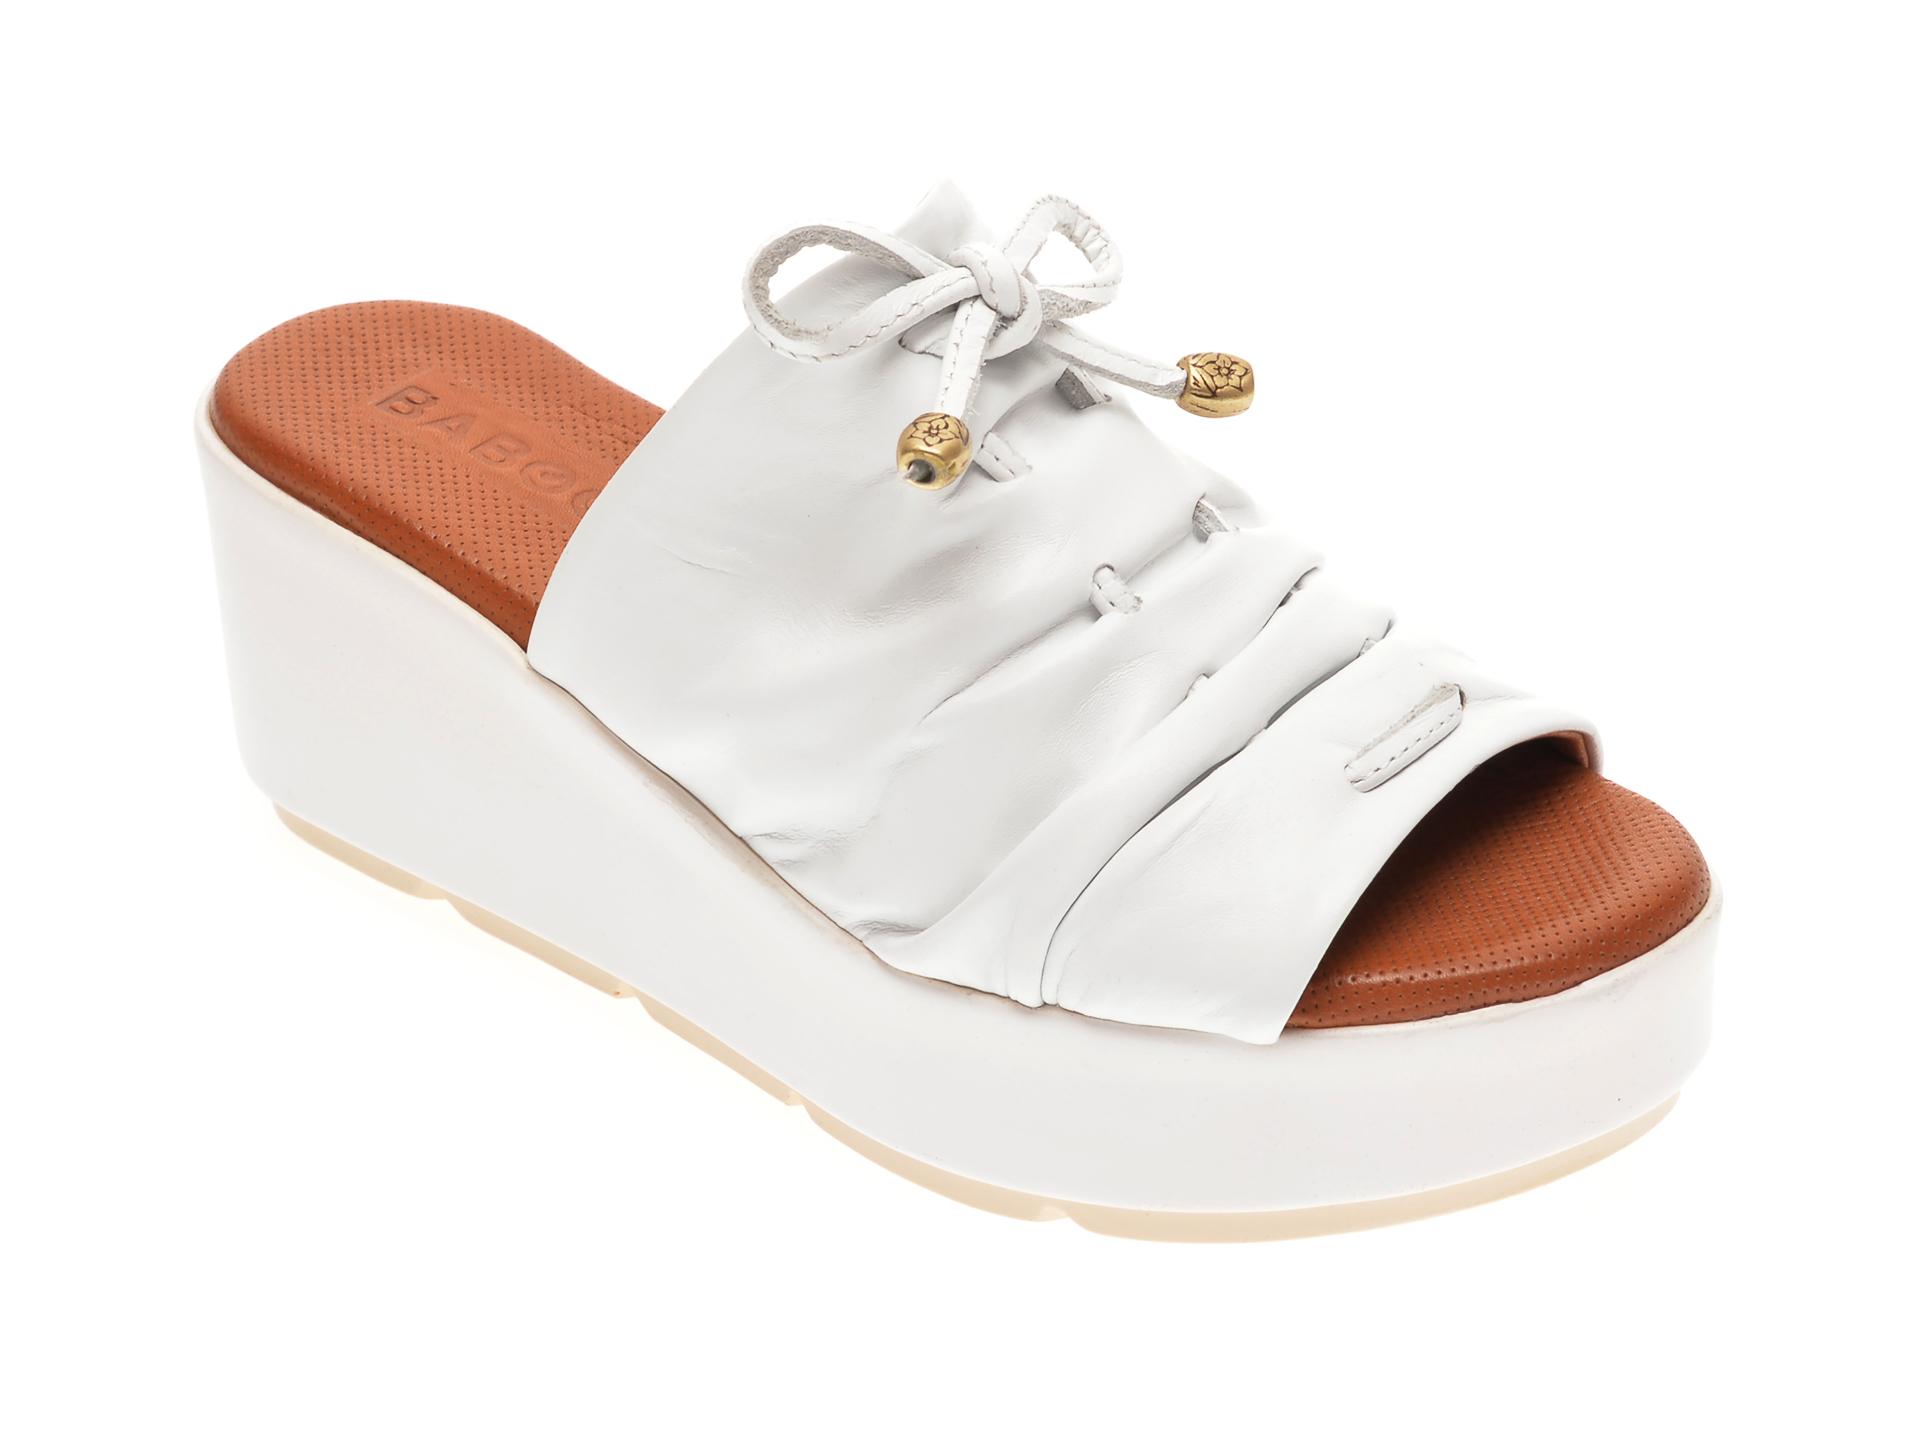 Papuci BABOOS albi, 2512, din piele naturala